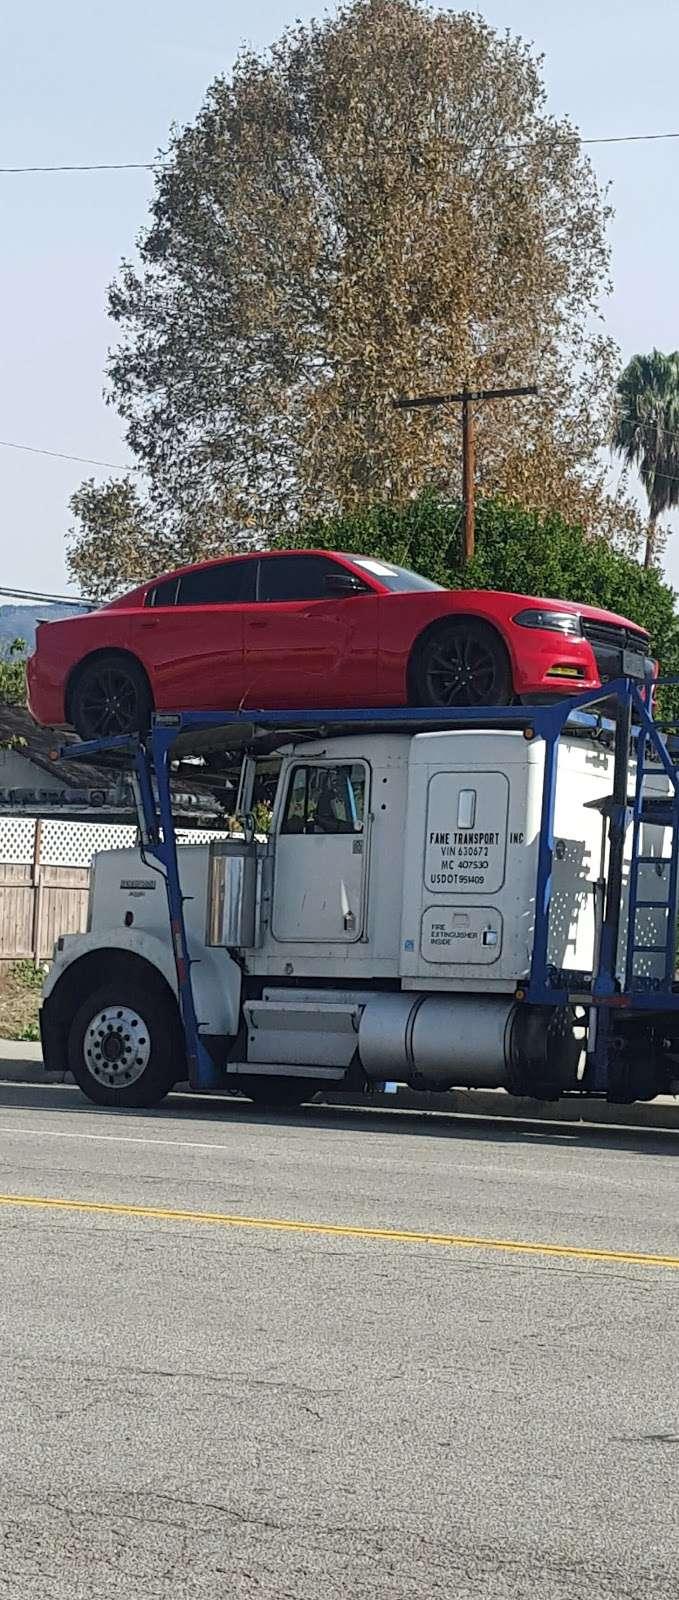 Gabis Auto Repair & Body Shop - car repair    Photo 4 of 4   Address: 2228 N Golden Ave, San Bernardino, CA 92404, USA   Phone: (909) 883-8591